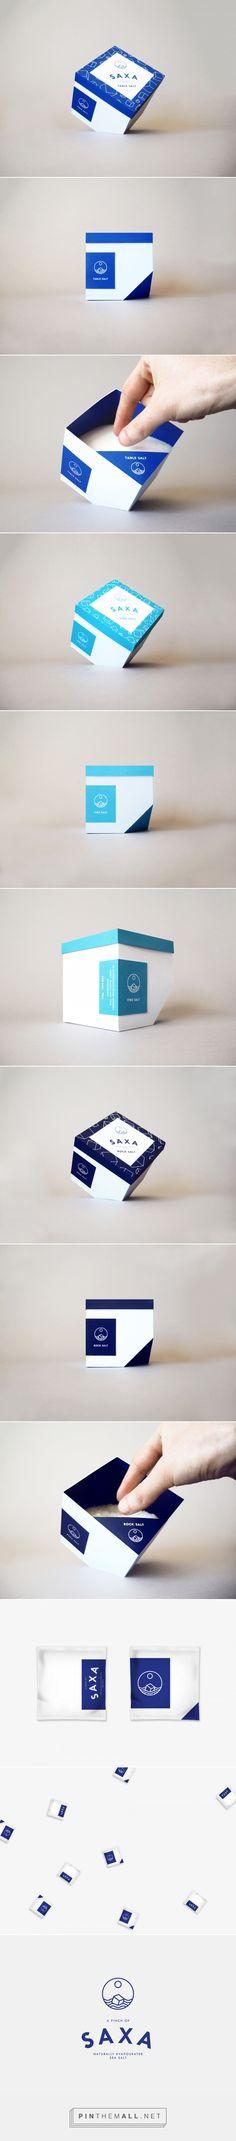 Saxa / Salt brand /